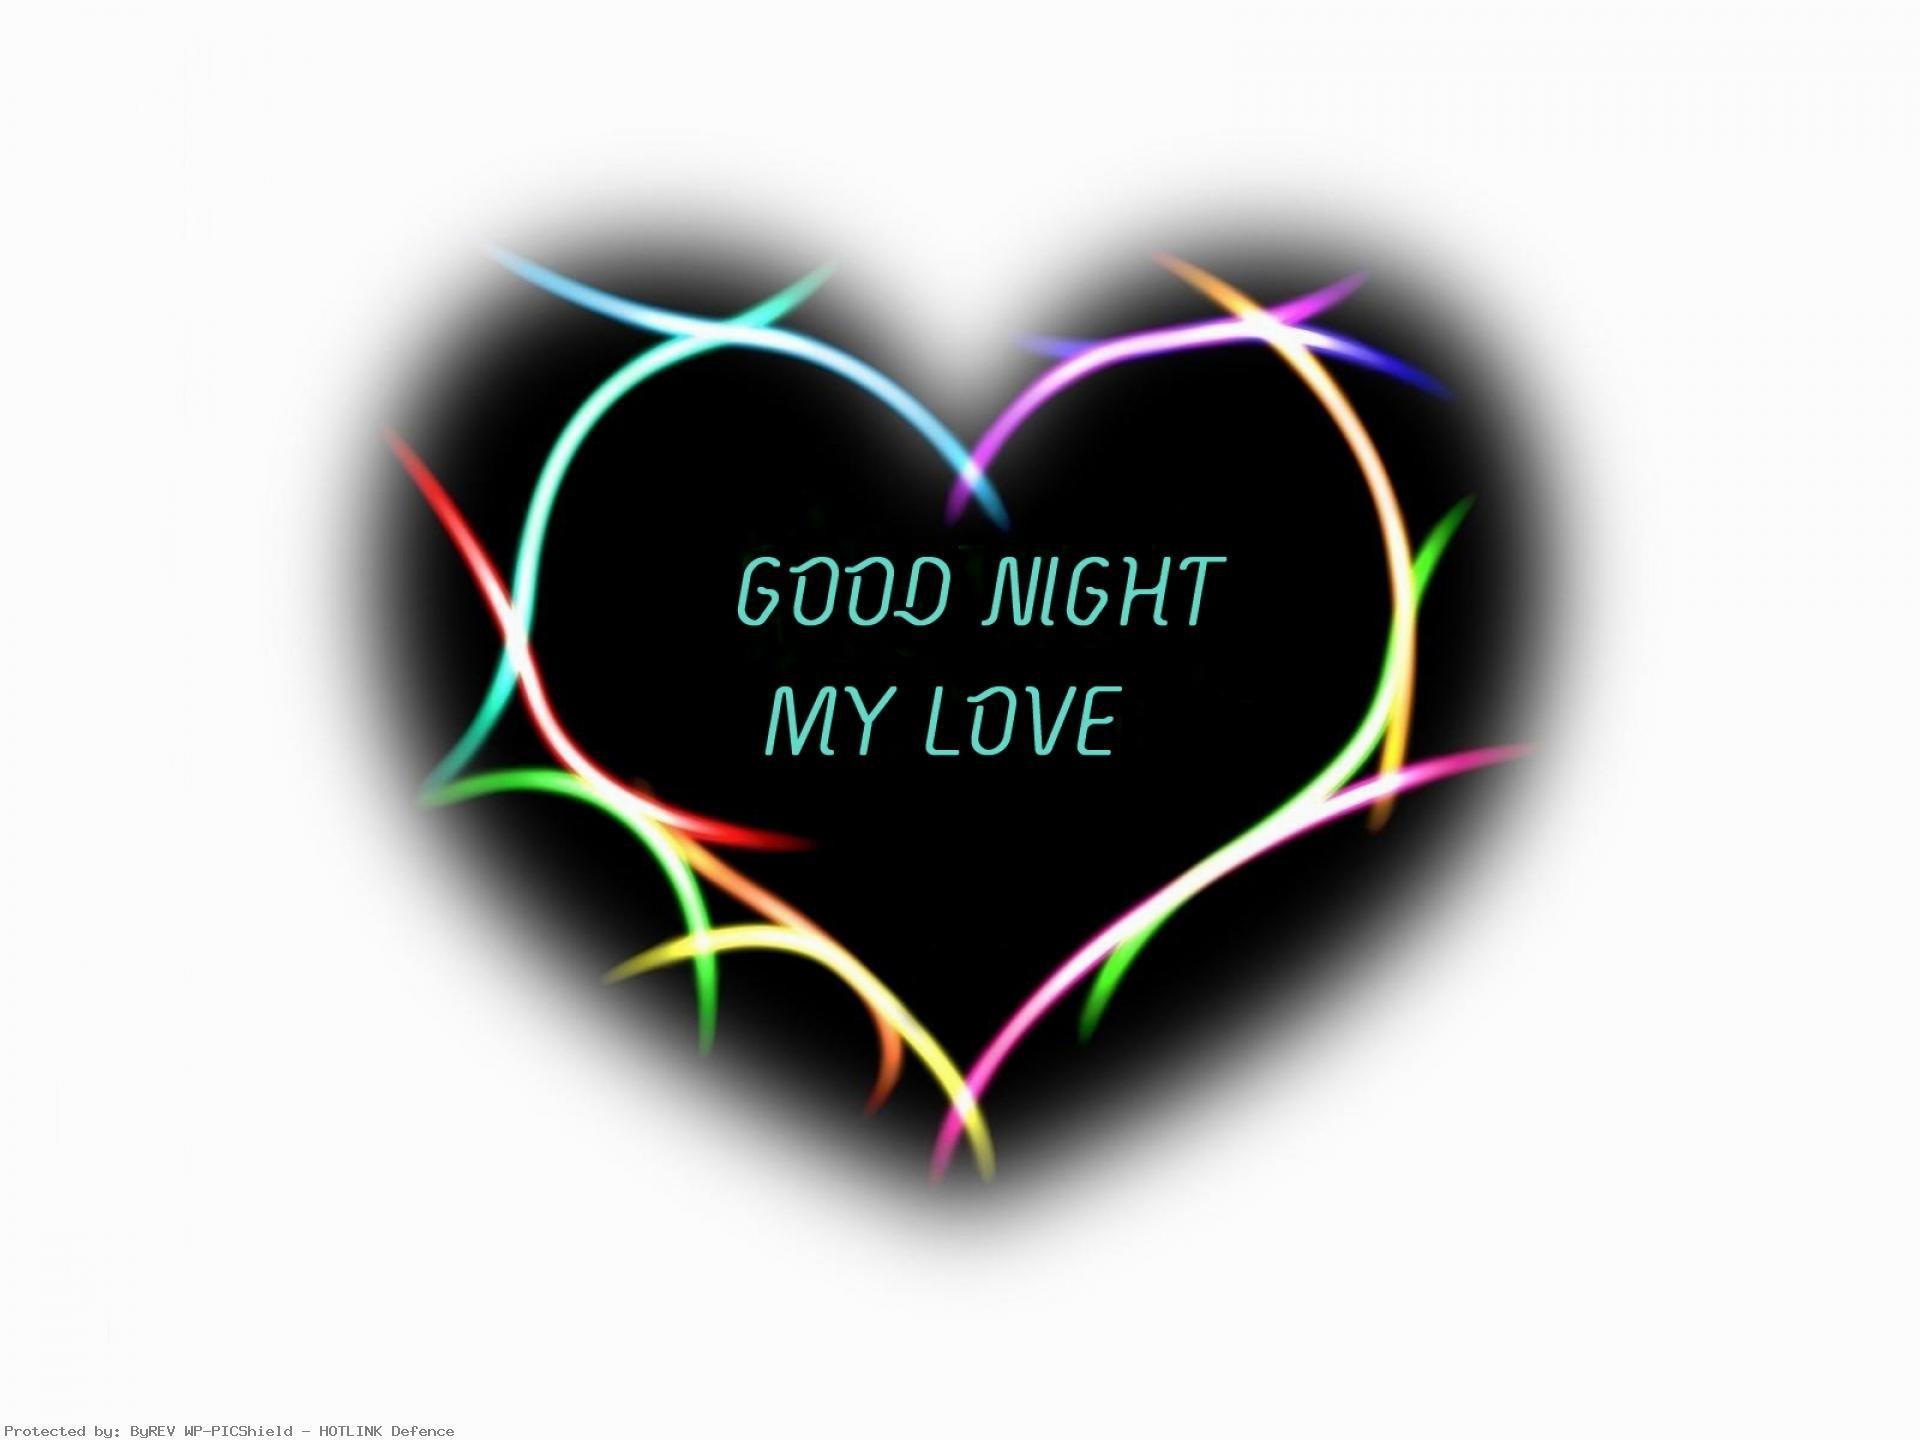 Good-Night-Love-Heart-Images-HD-1080p-wallpaper-